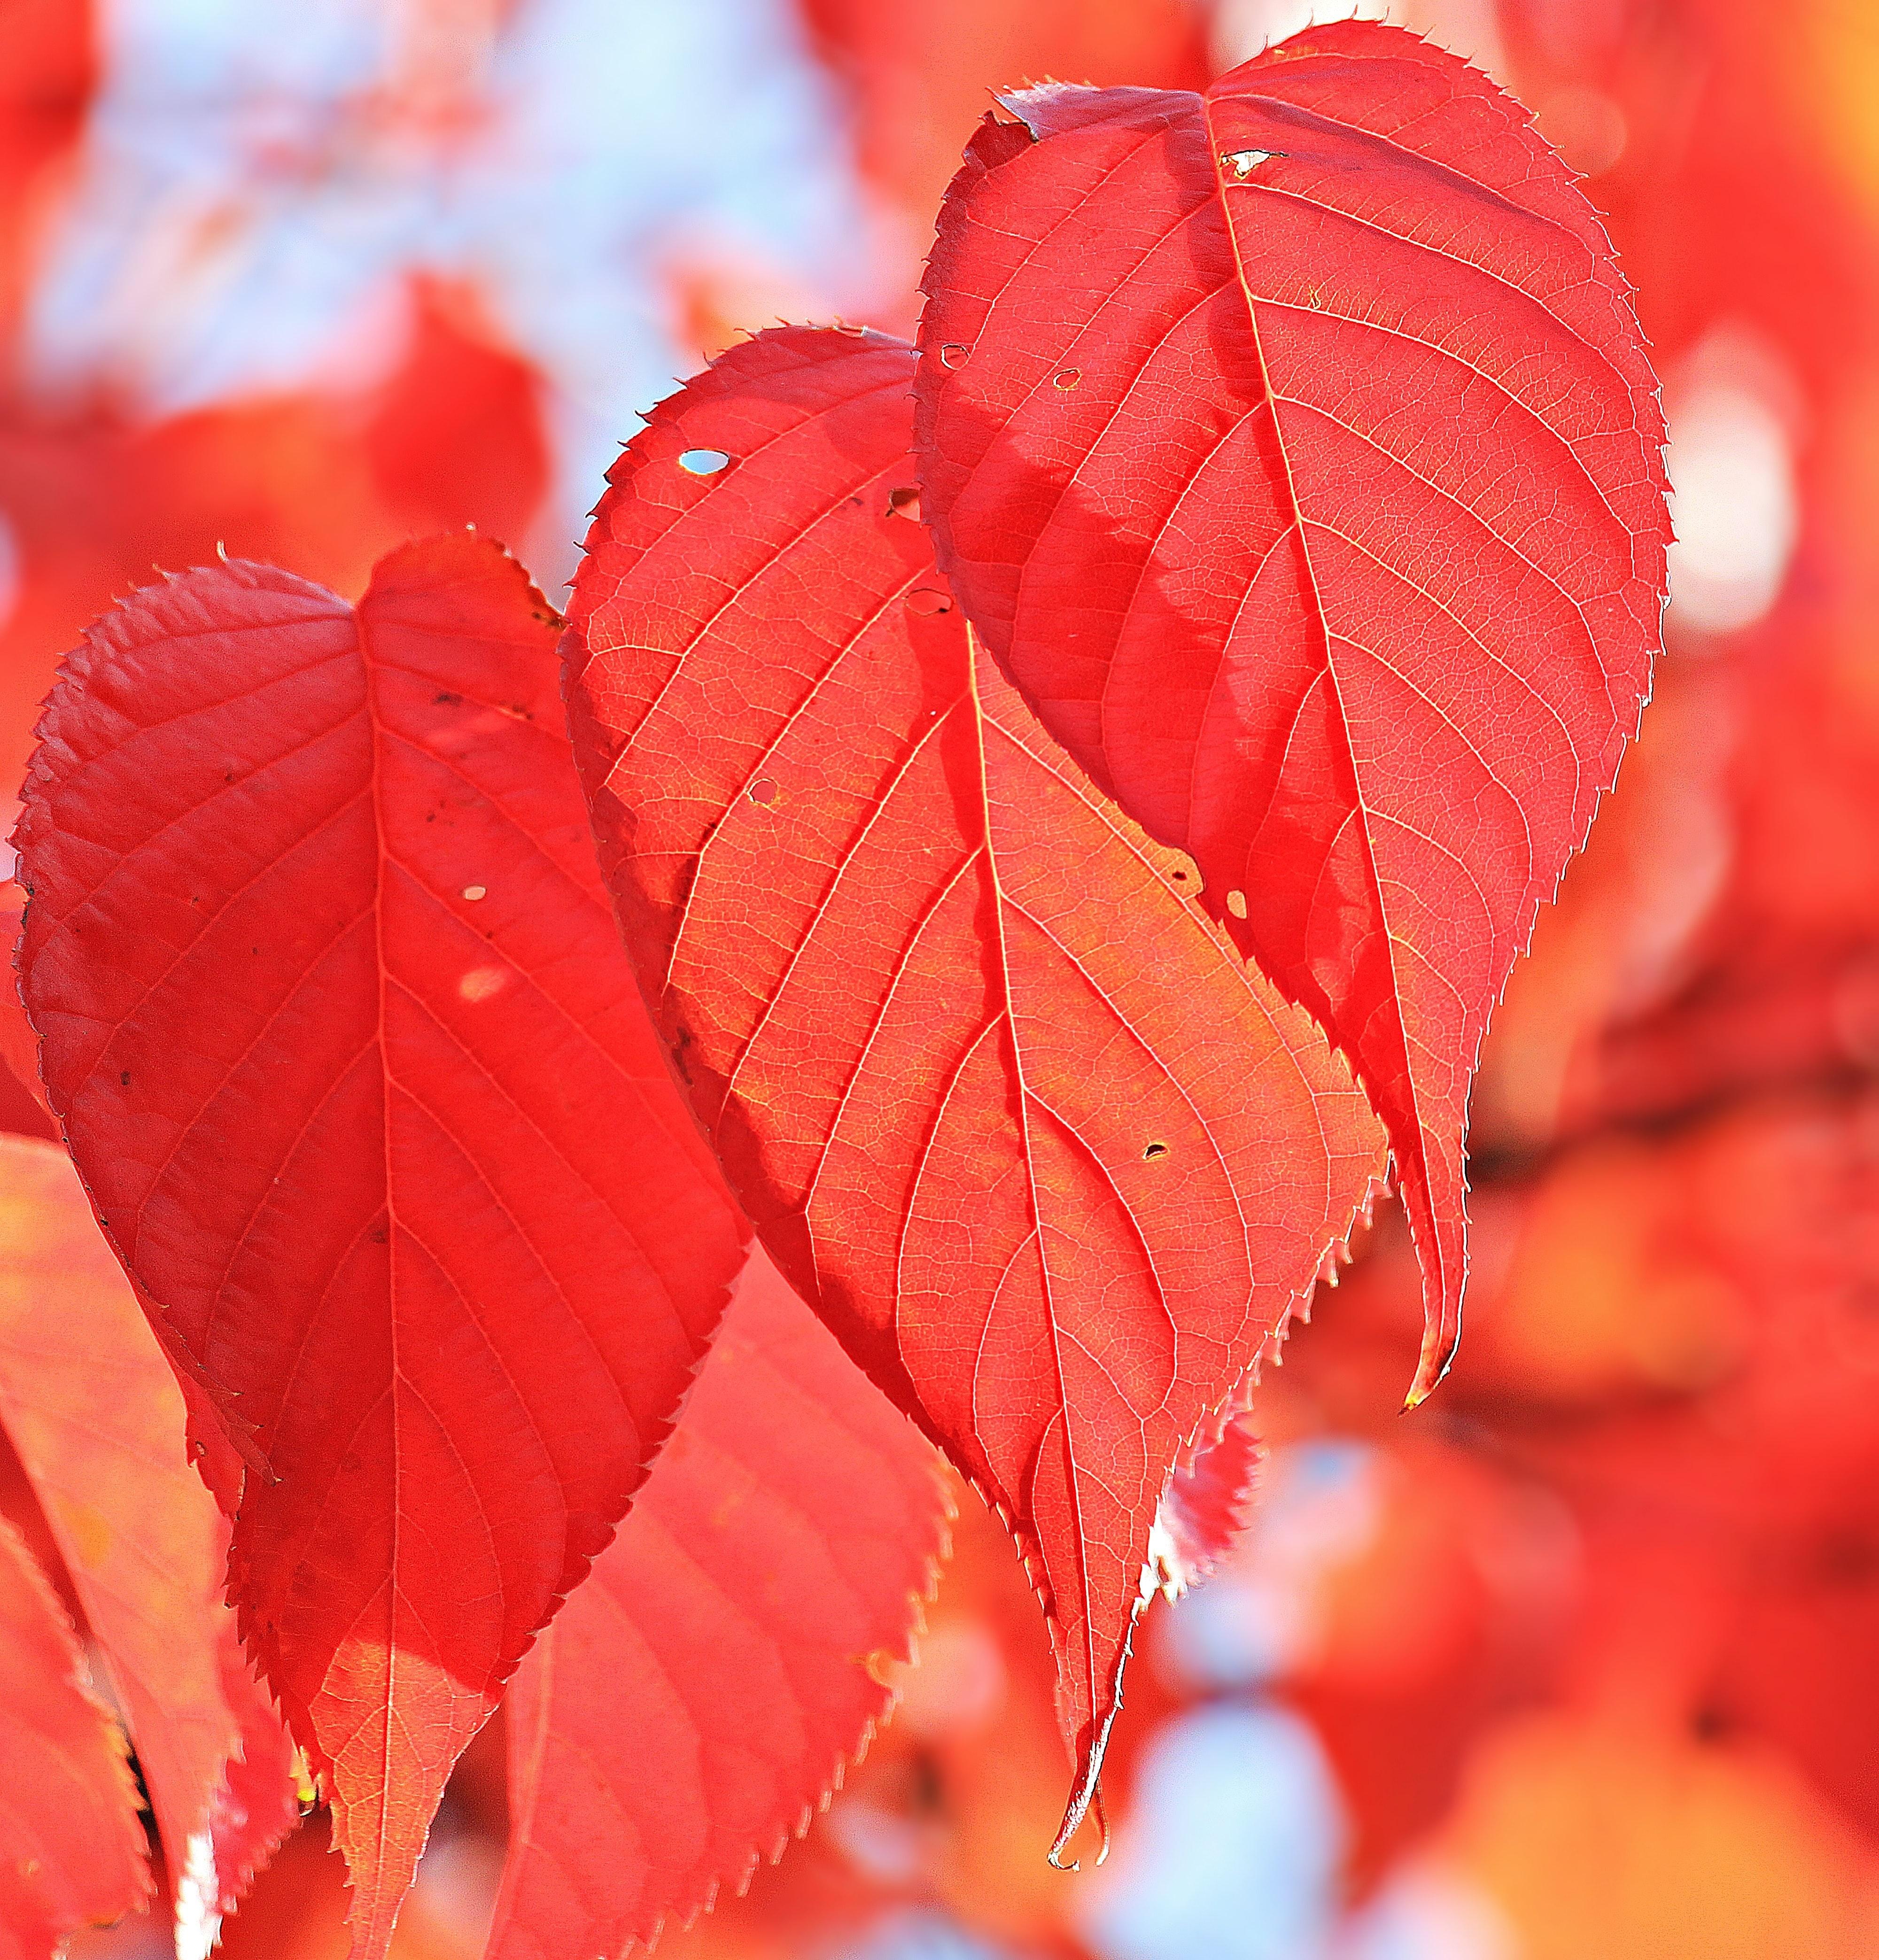 Red Leaf, Focus, Wood, Season, Red, HQ Photo